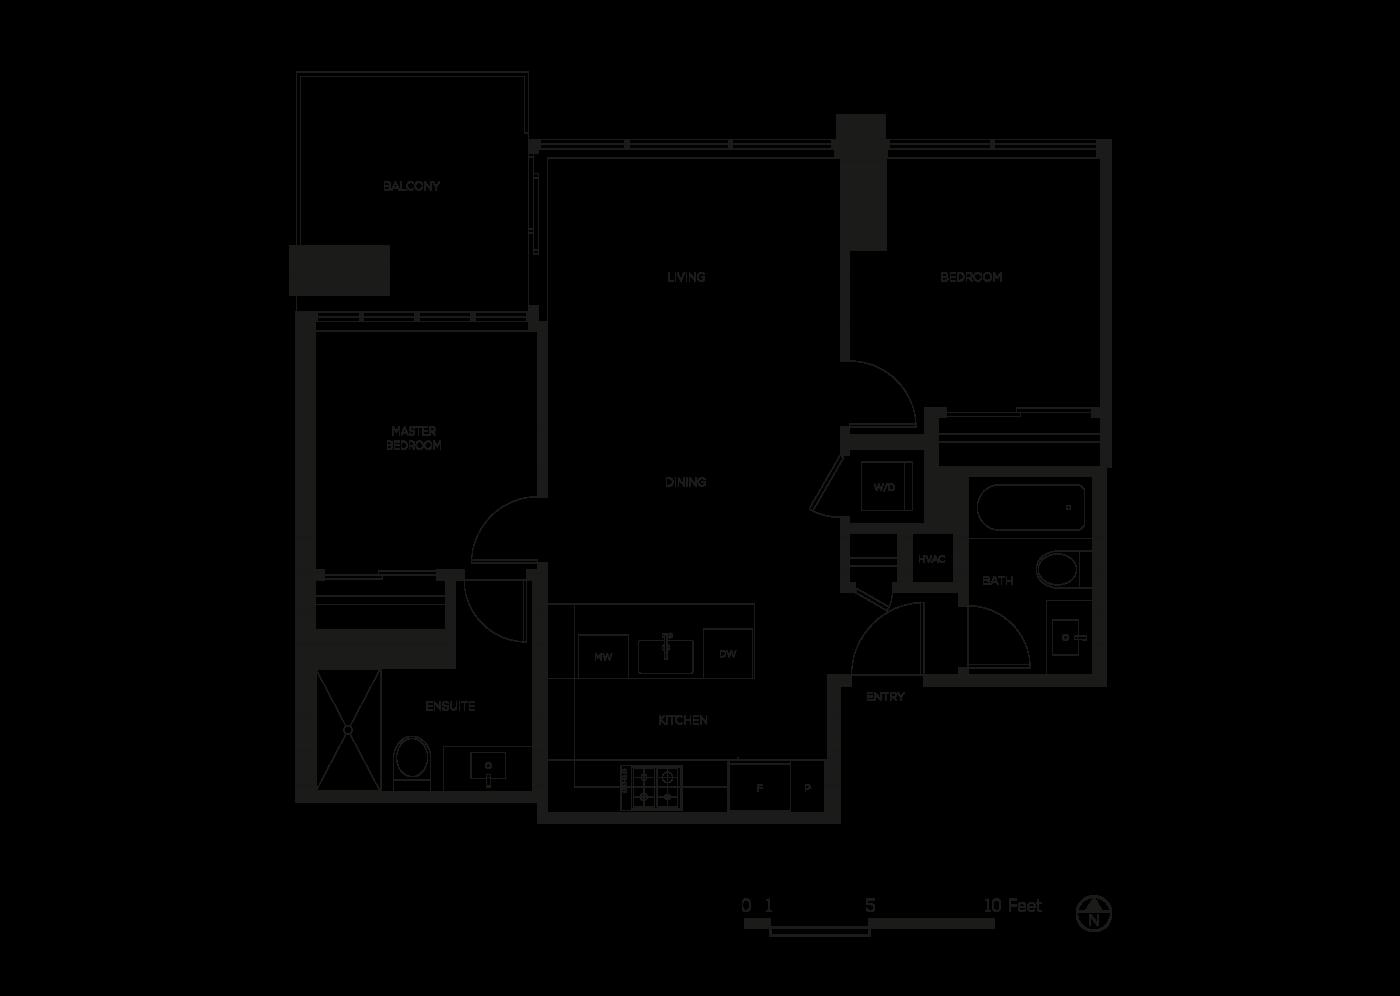 Plan C1 (Level 3)